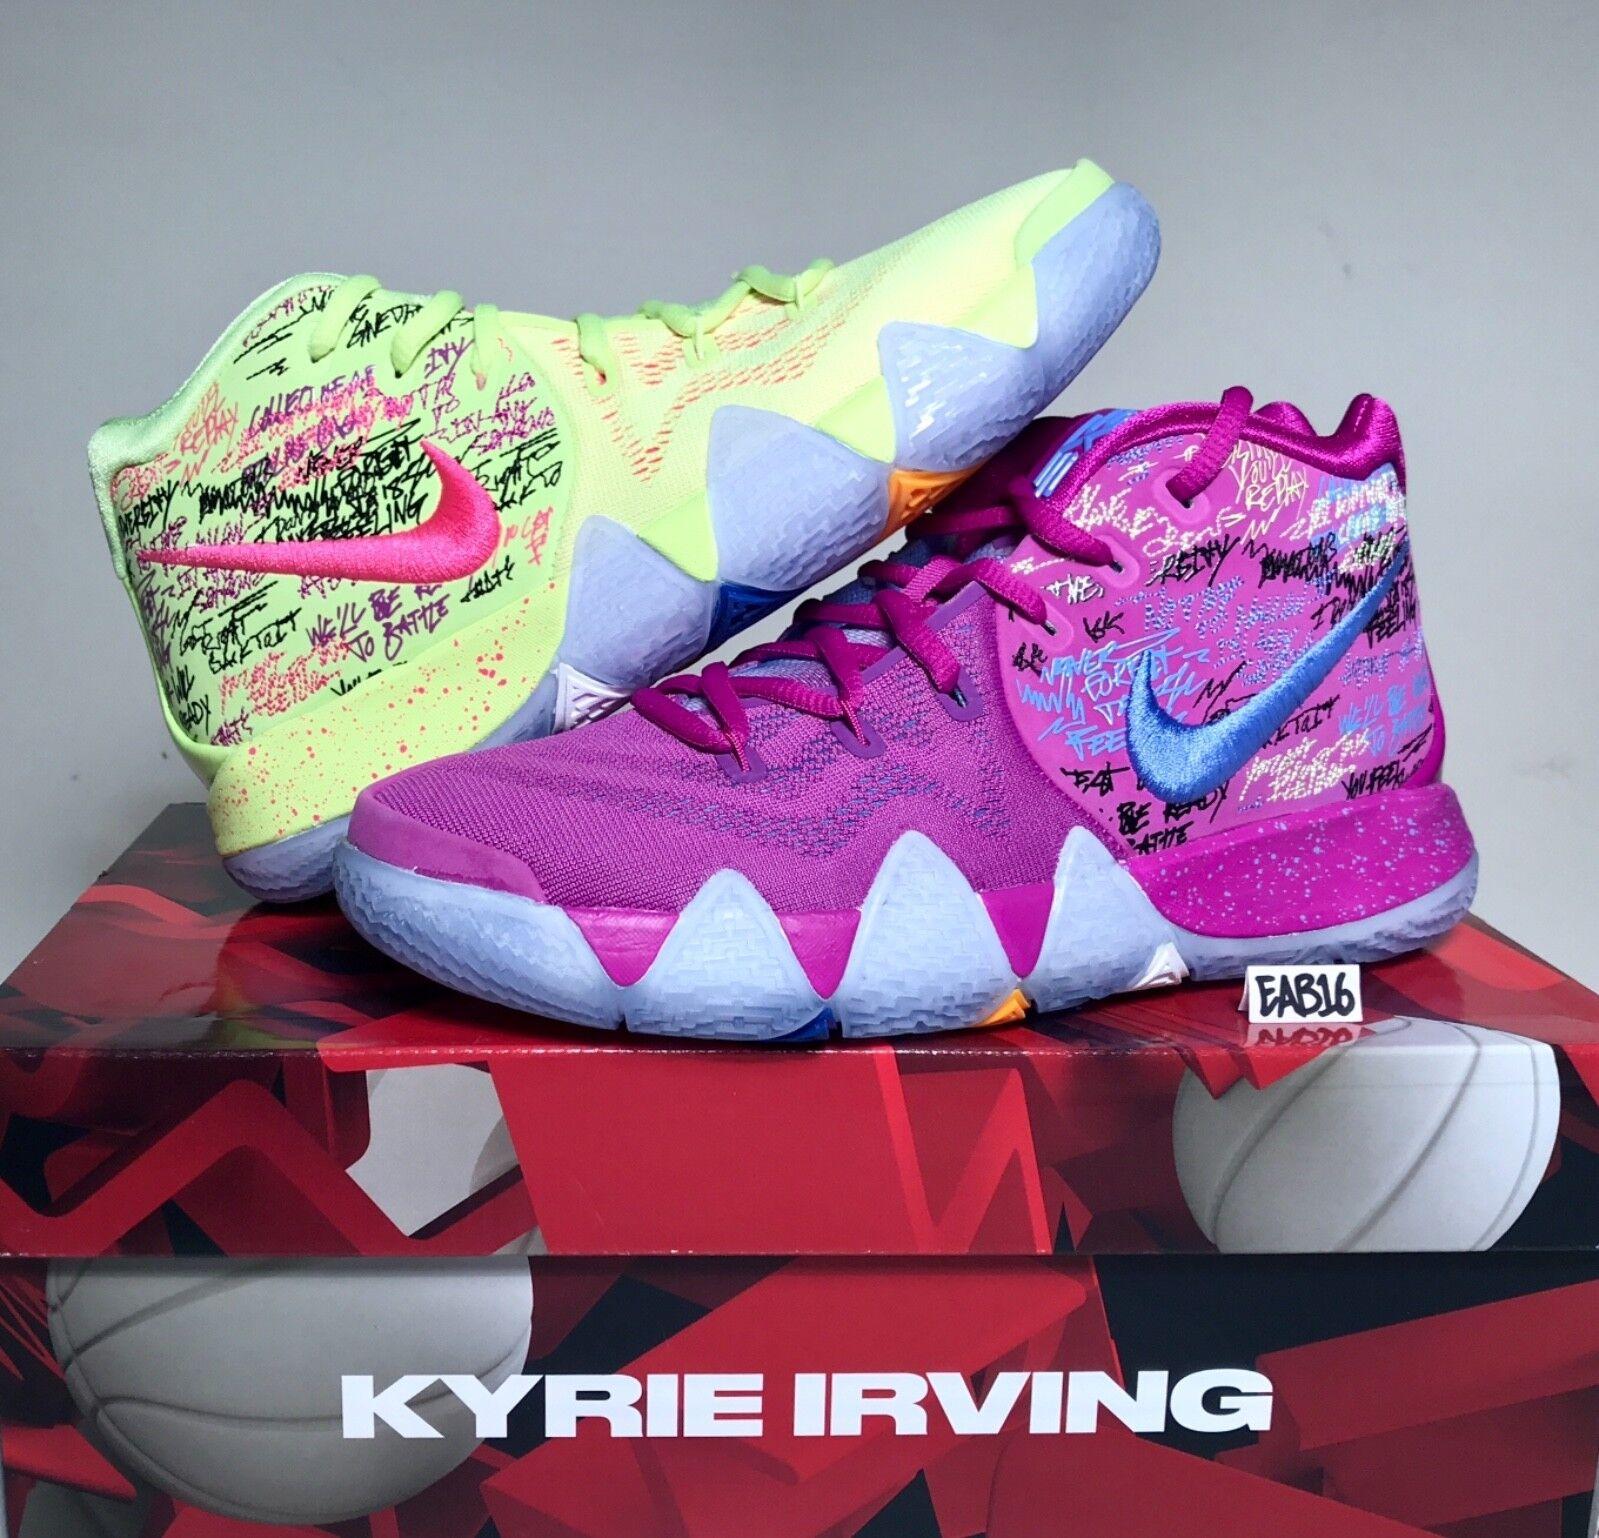 Nike kyrie irving 4 iv konfetti lila und gelb - farbe mens gs kinder jungs